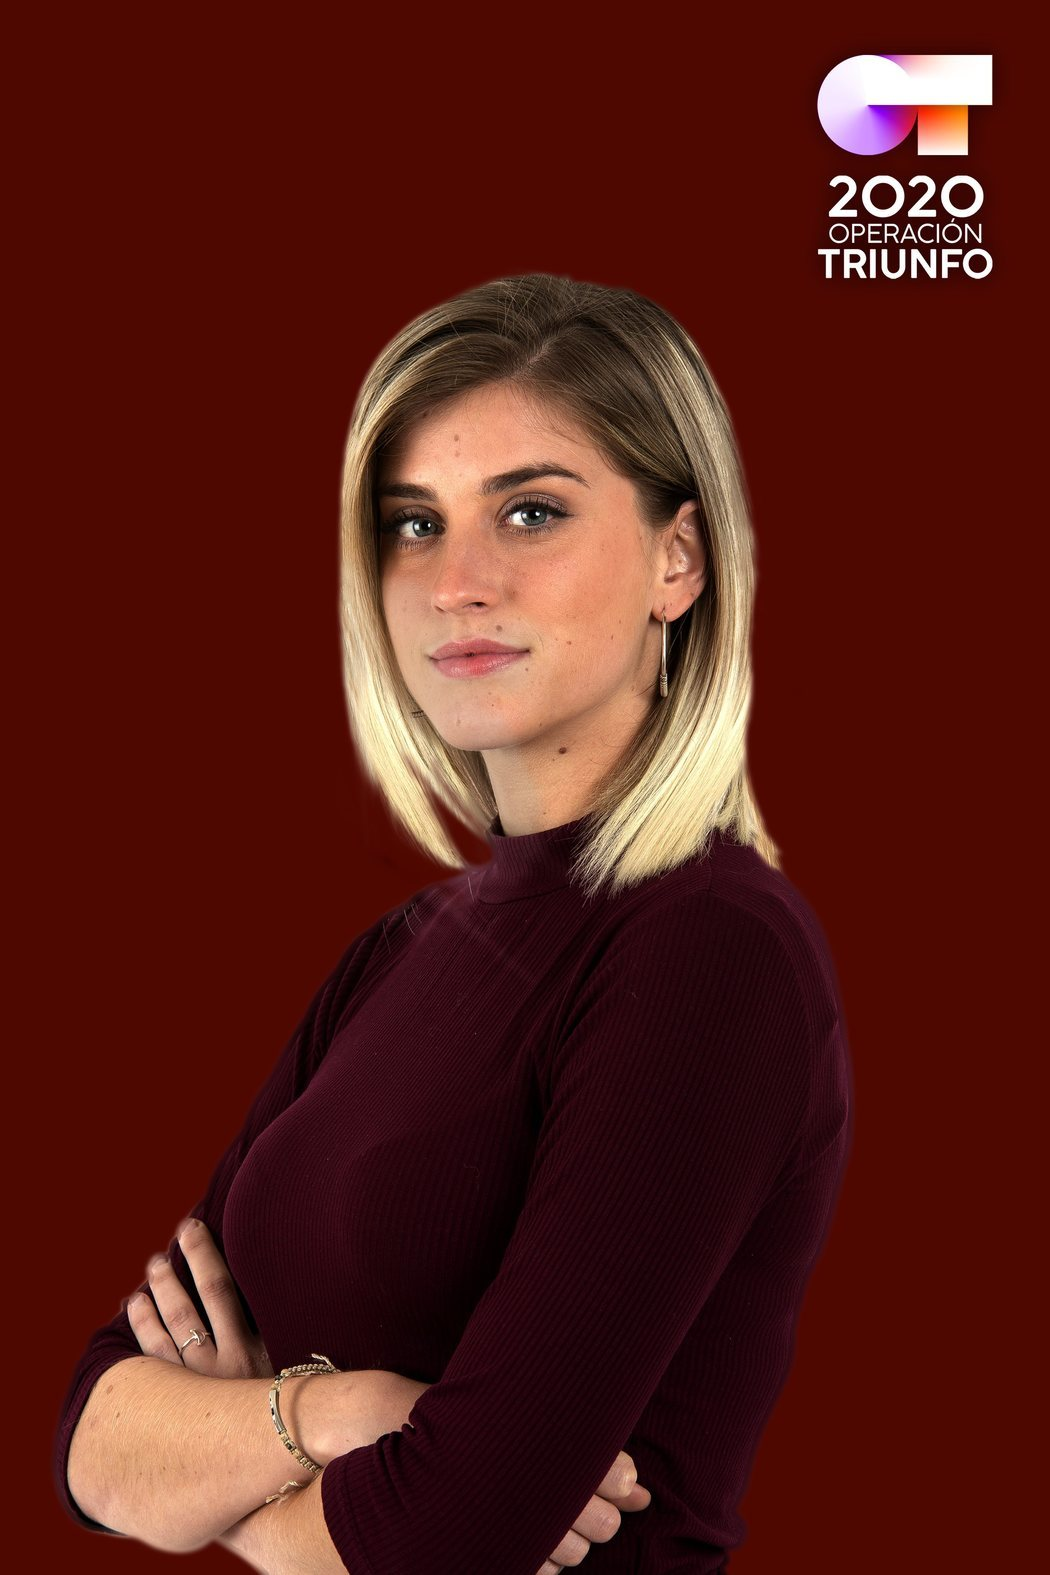 Samantha Gilabert, concursante de 'OT 2020'